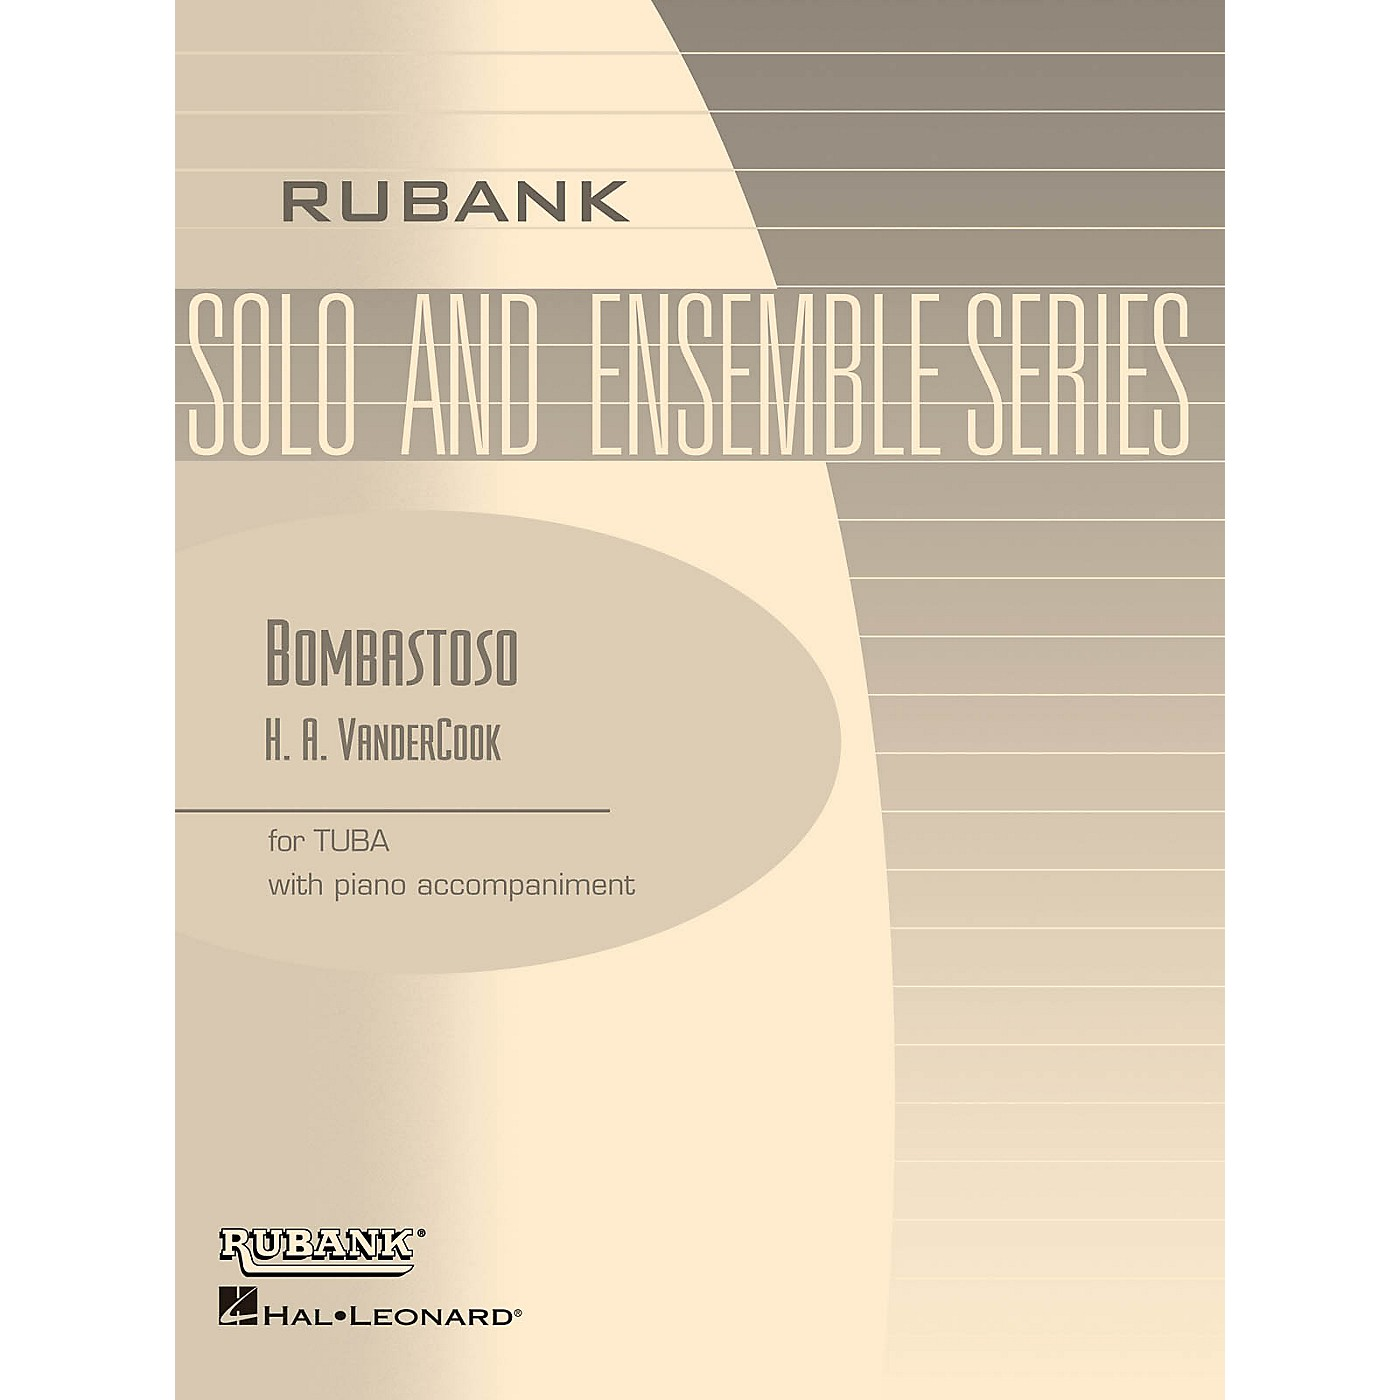 Rubank Publications Bombastoso (Caprice) Rubank Solo/Ensemble Sheet Series Softcover thumbnail